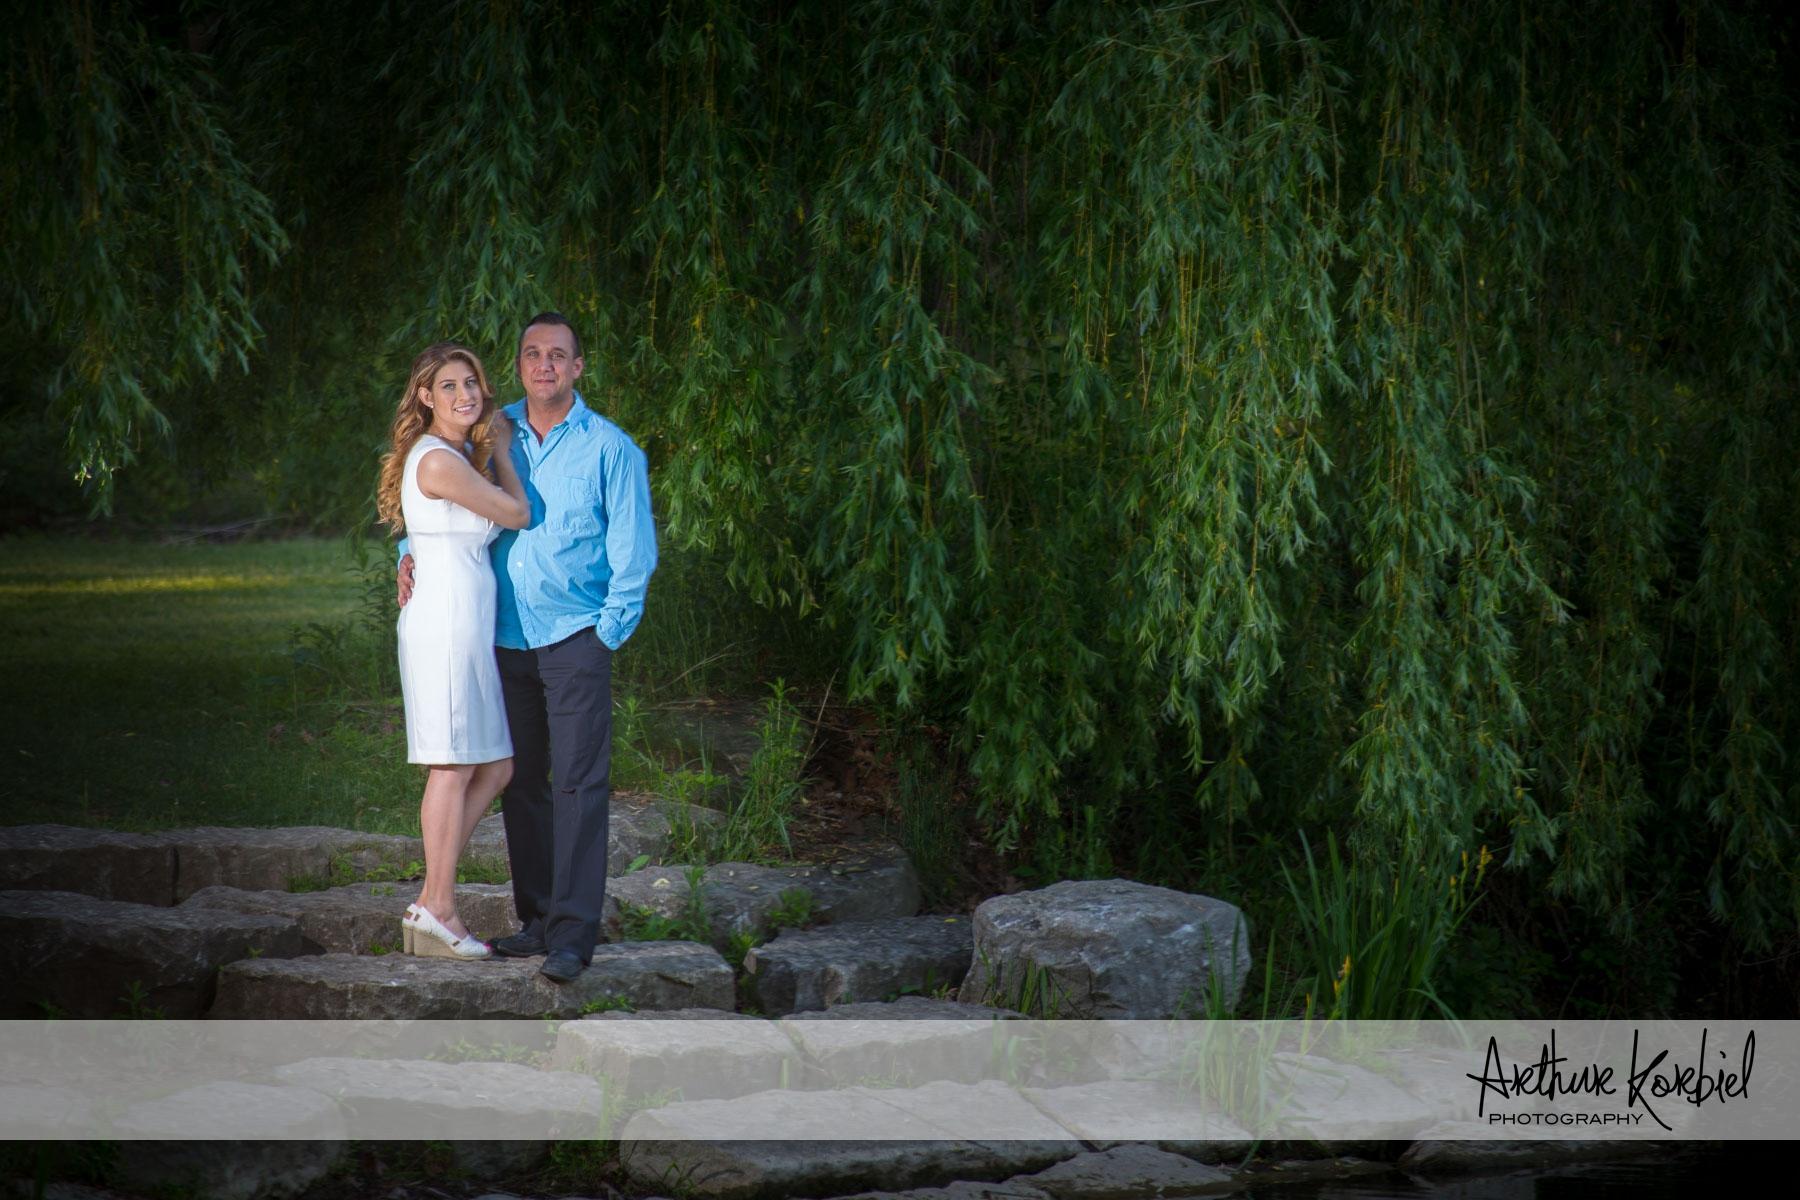 Arthur Korbiel Photography - London Engagement Photographer-031.jpg